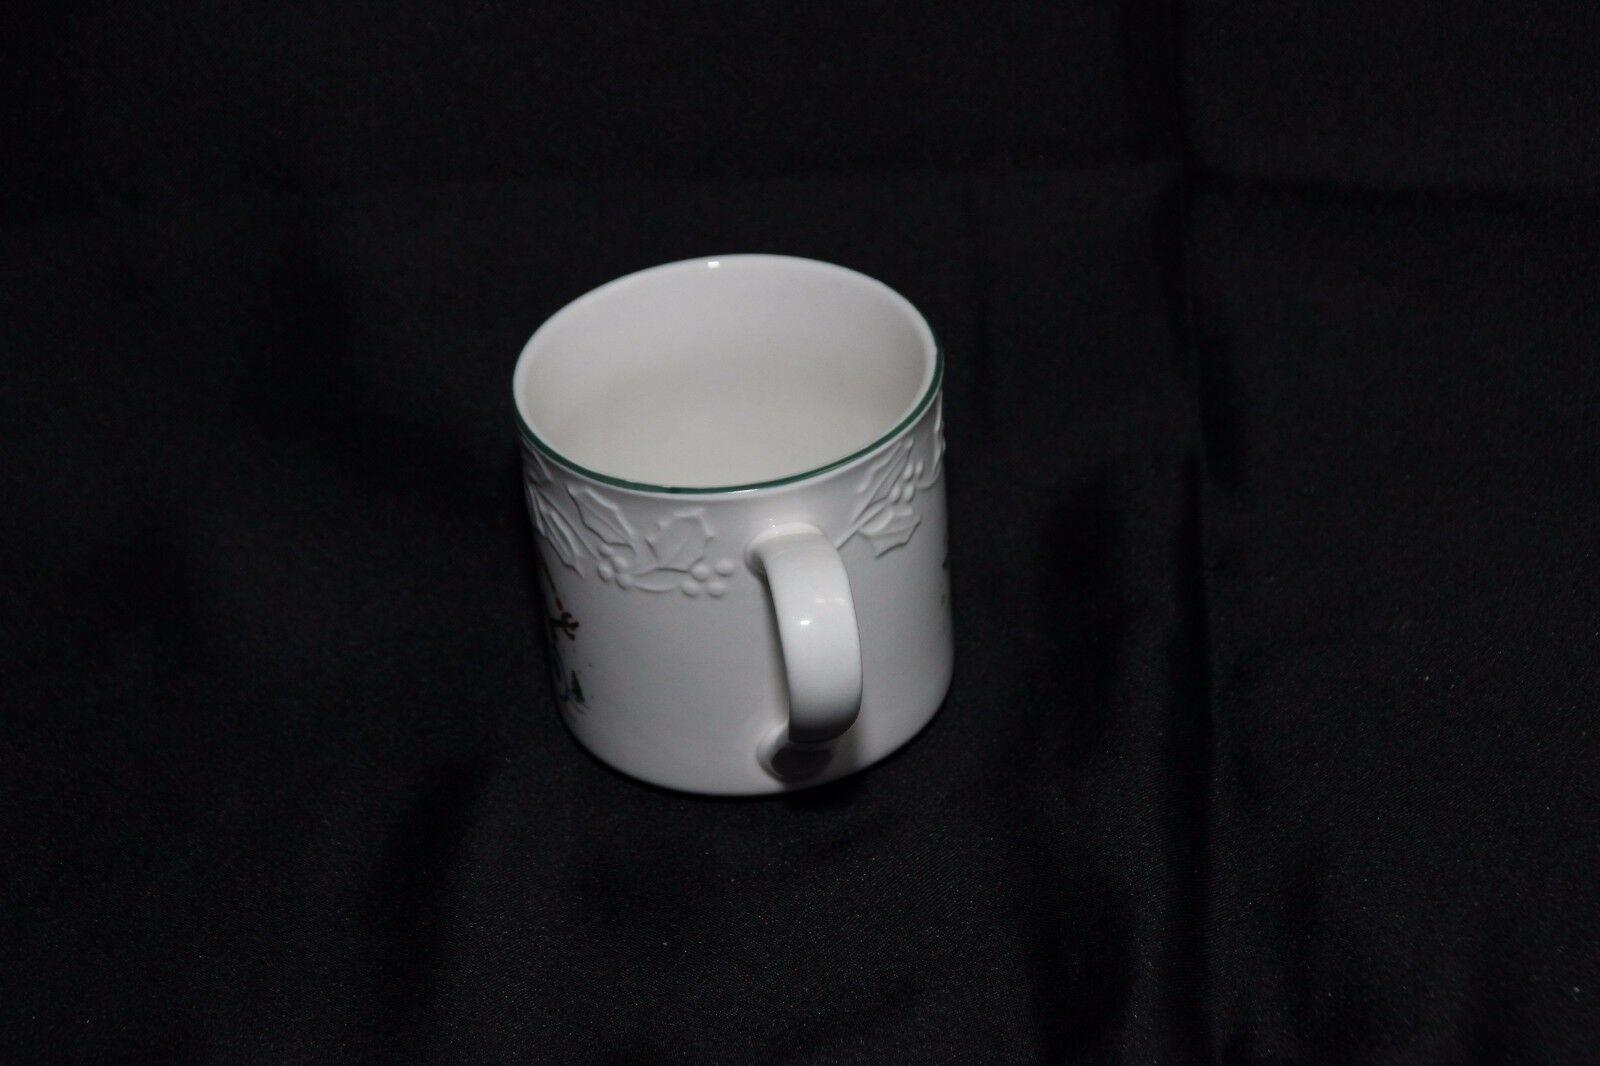 GEI Snowman Xmas 4 Cups 2 Saucers image 6